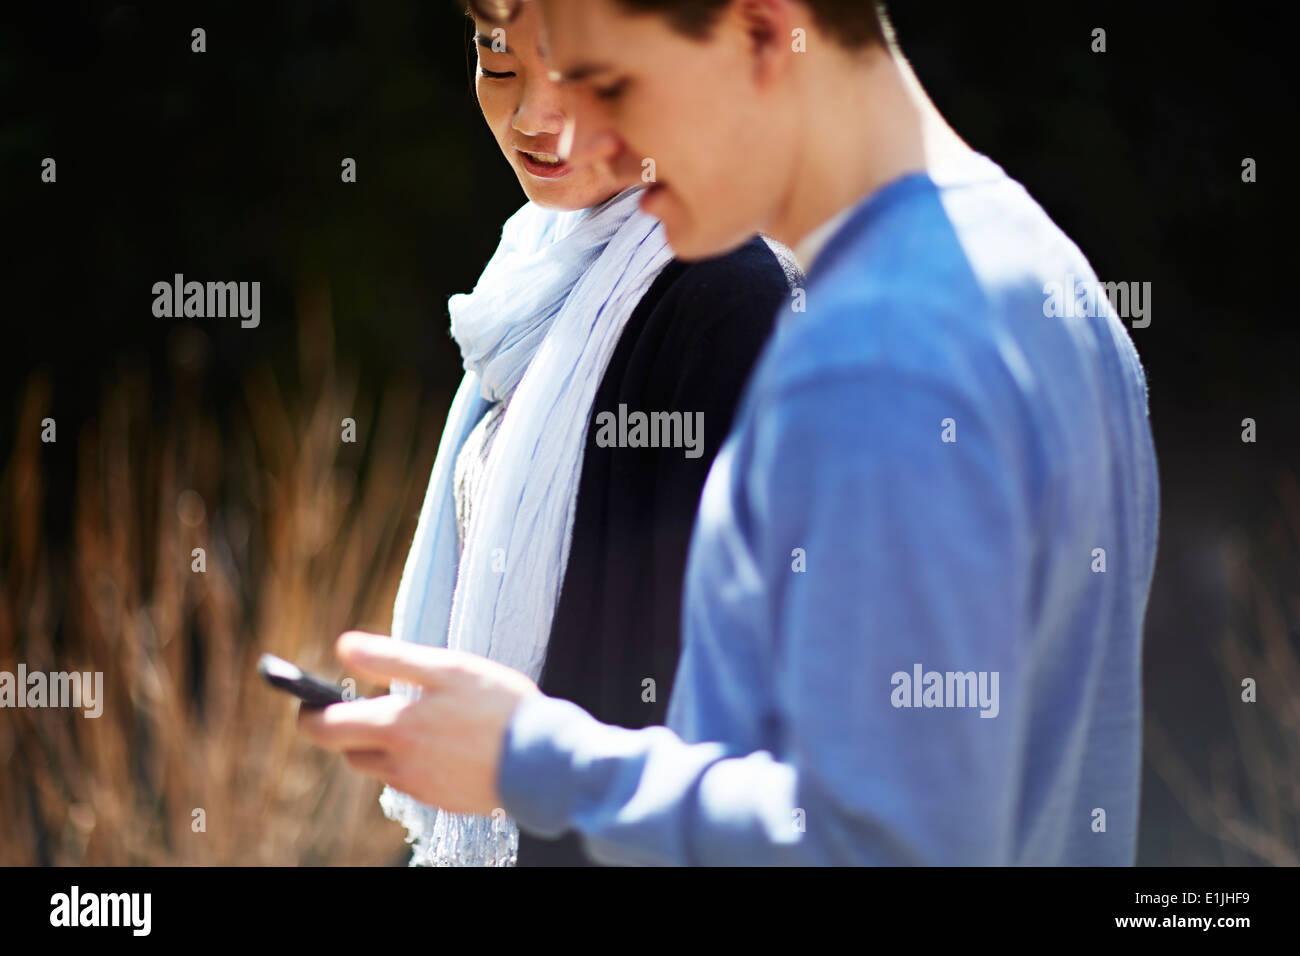 Jeune couple, man using cell phone Photo Stock